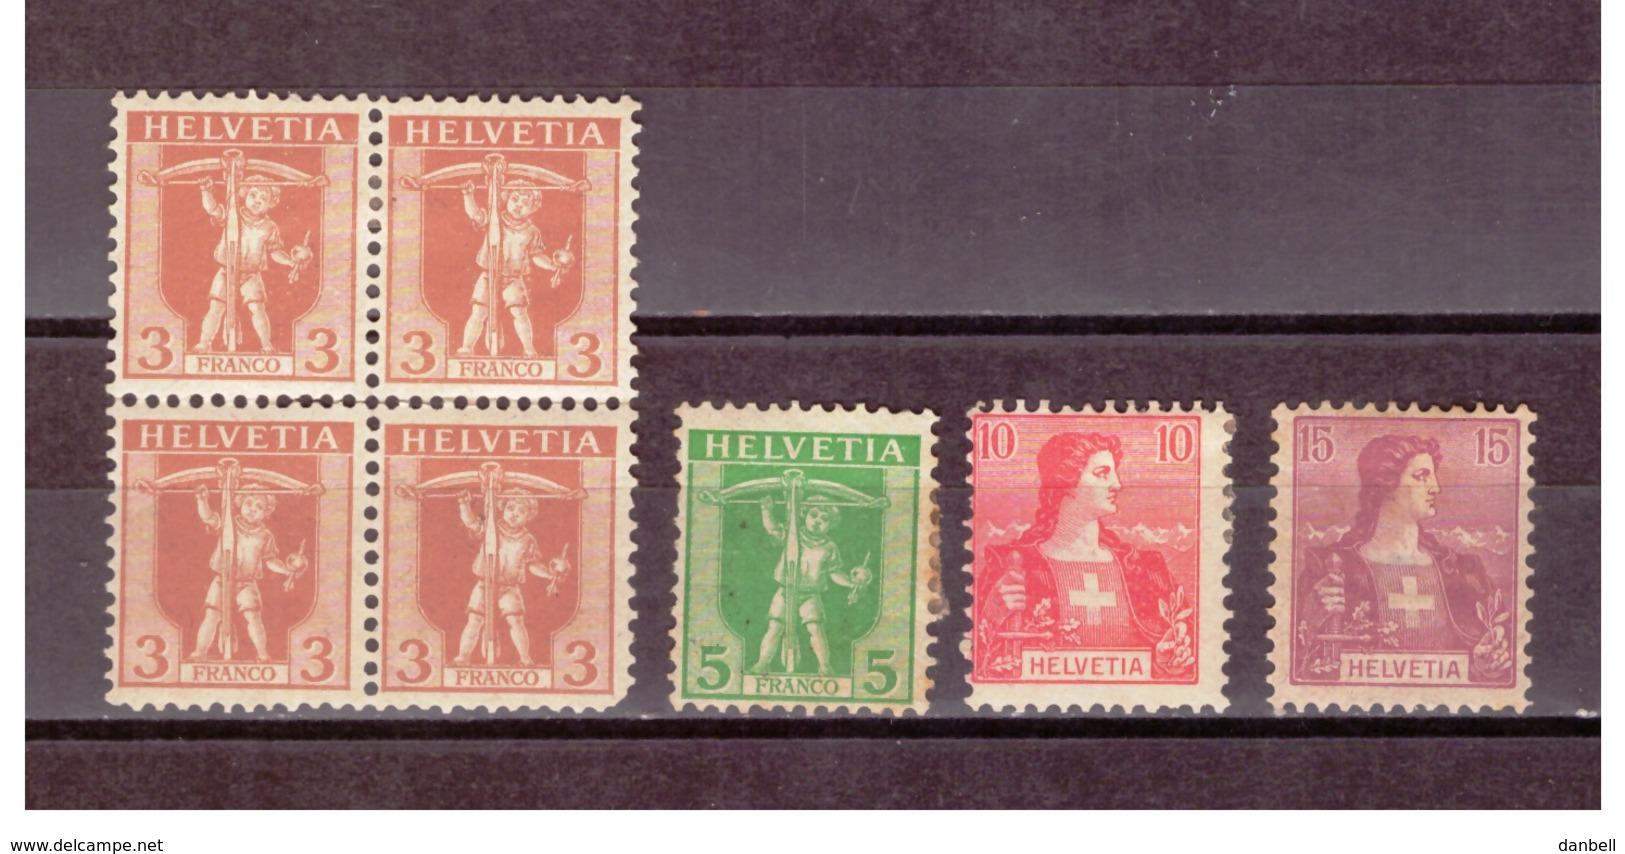 CH39) 1907 TELL -HELVETIA Serietta 4 Val Unif.113-118 MLH - Svizzera